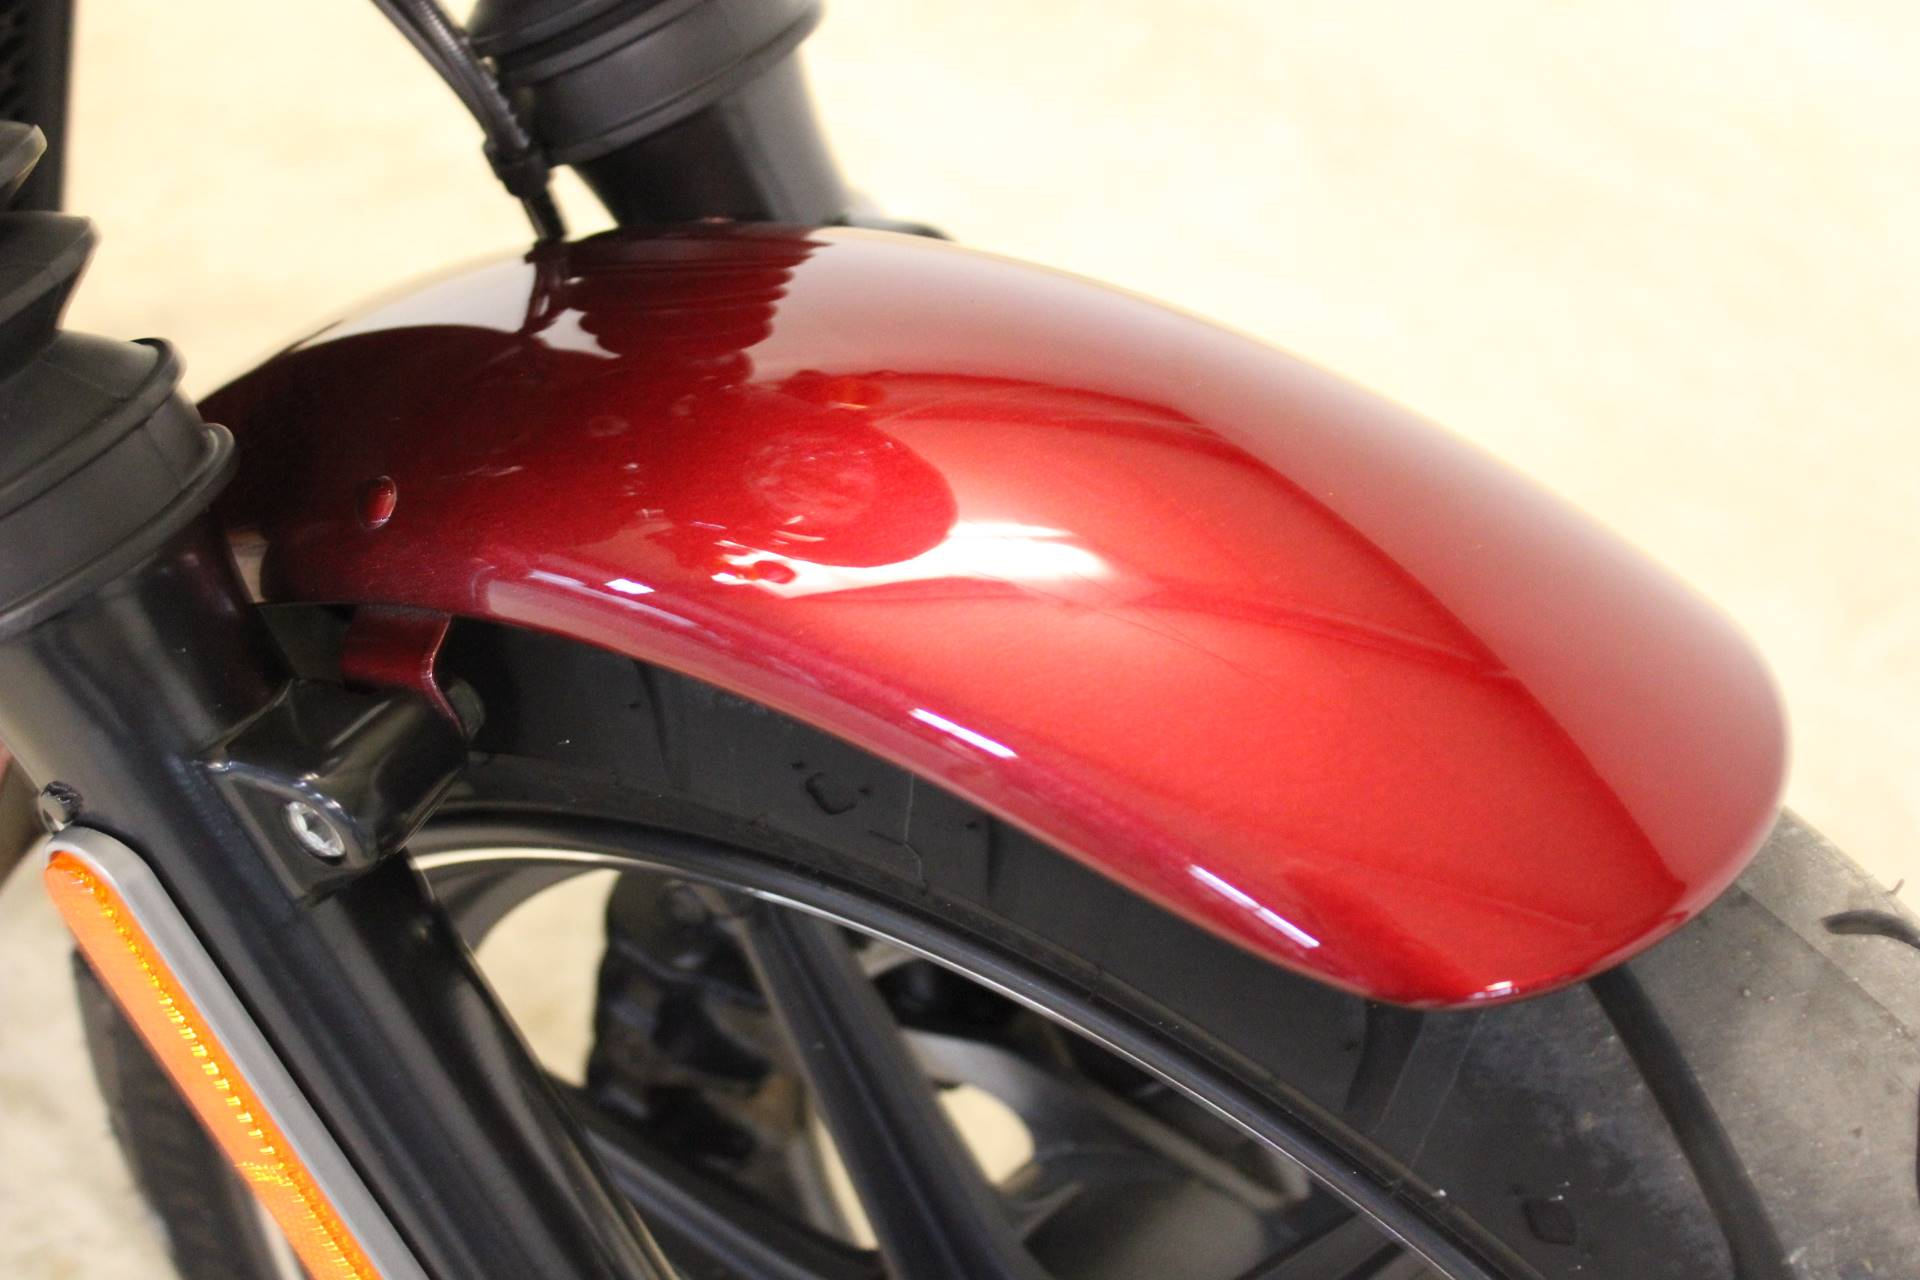 2017 Harley-Davidson Street 750 12